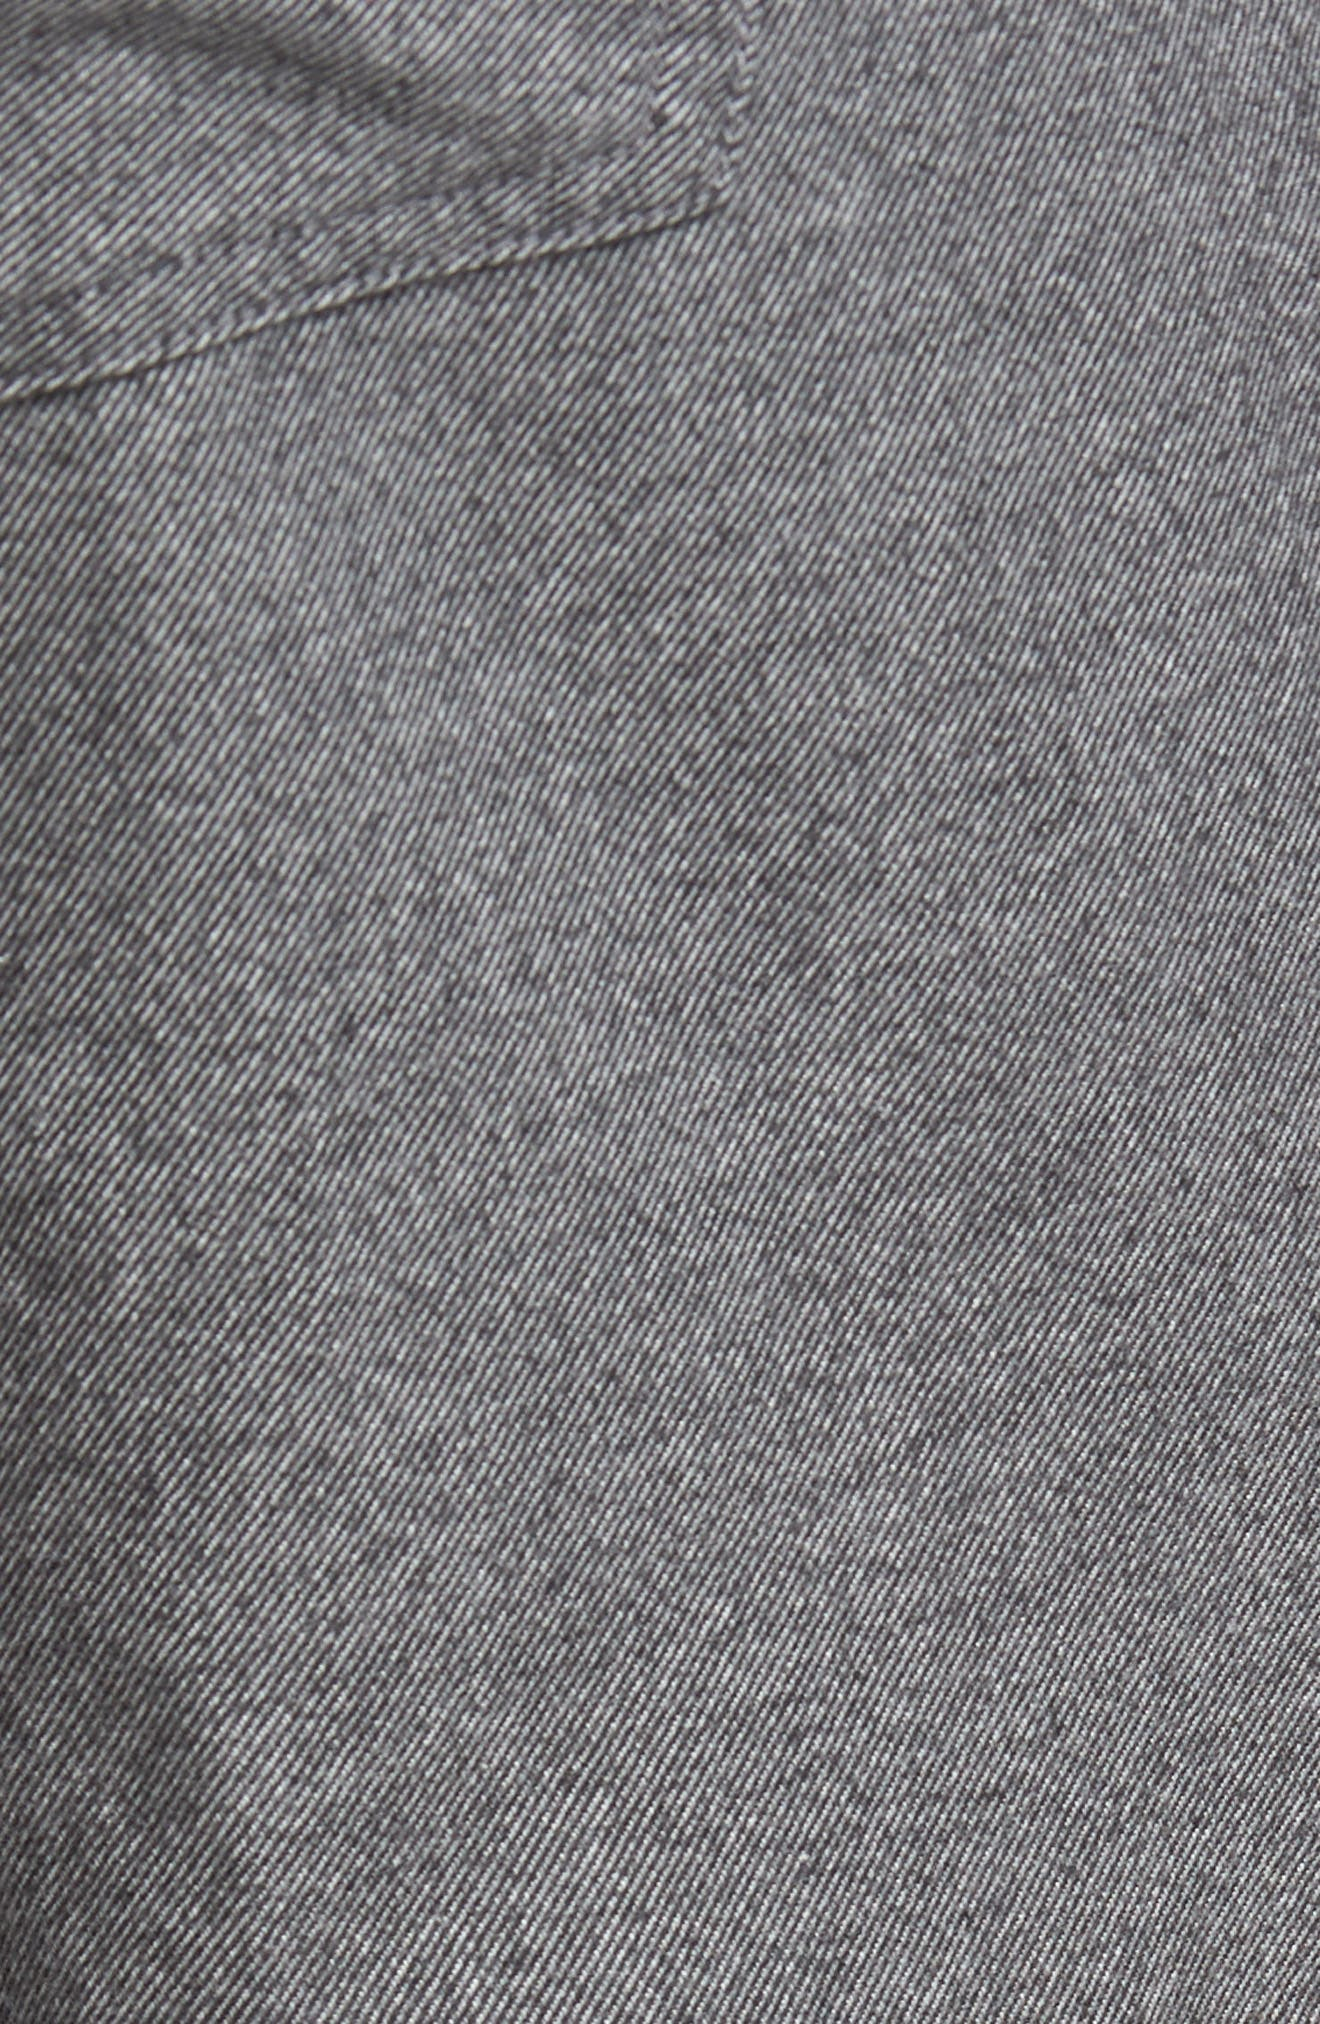 Alternate Image 5  - Peter Millar Mountainside Flannel Five-Pocket Pants